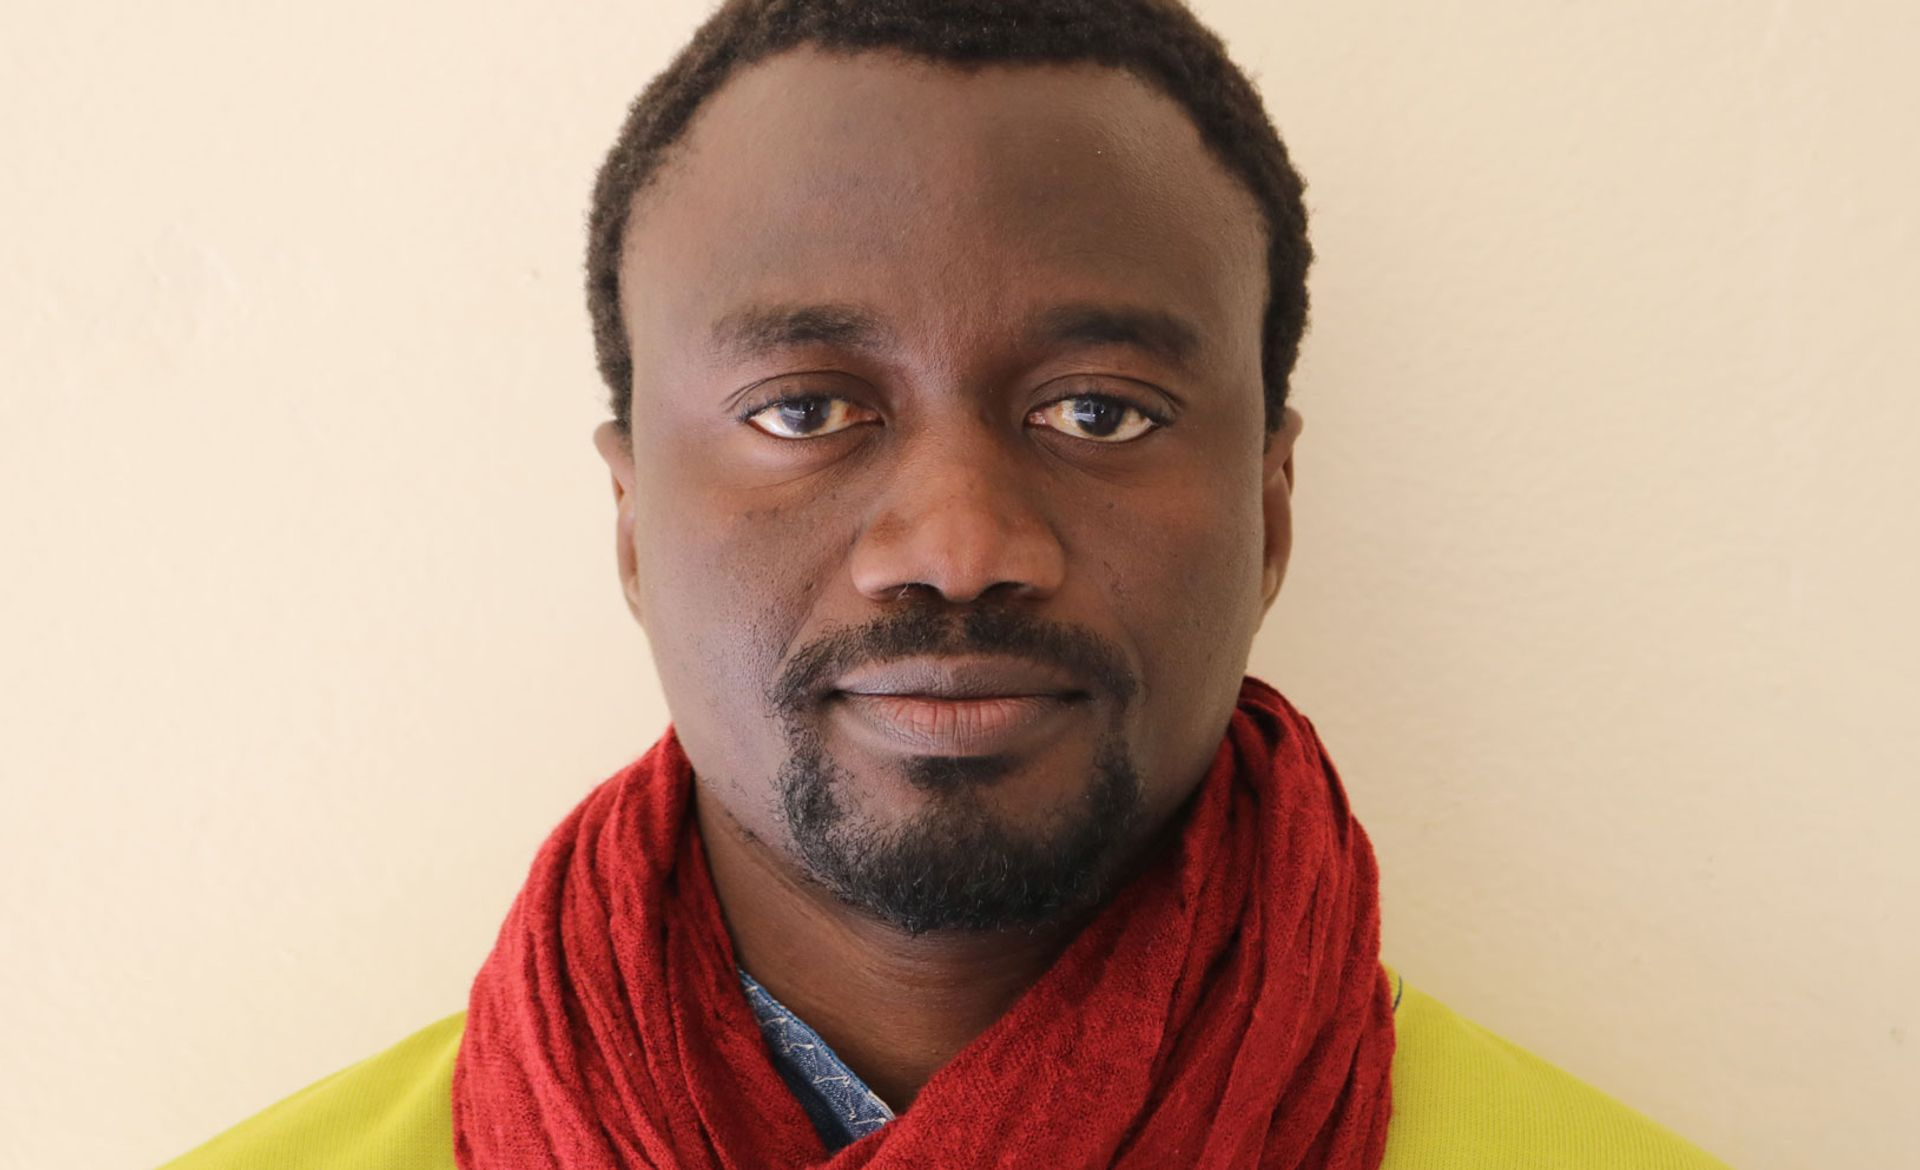 El Hadji Malick Ndiaye is an art historian and curator based in Dakar, Senegal Photo: Oumou